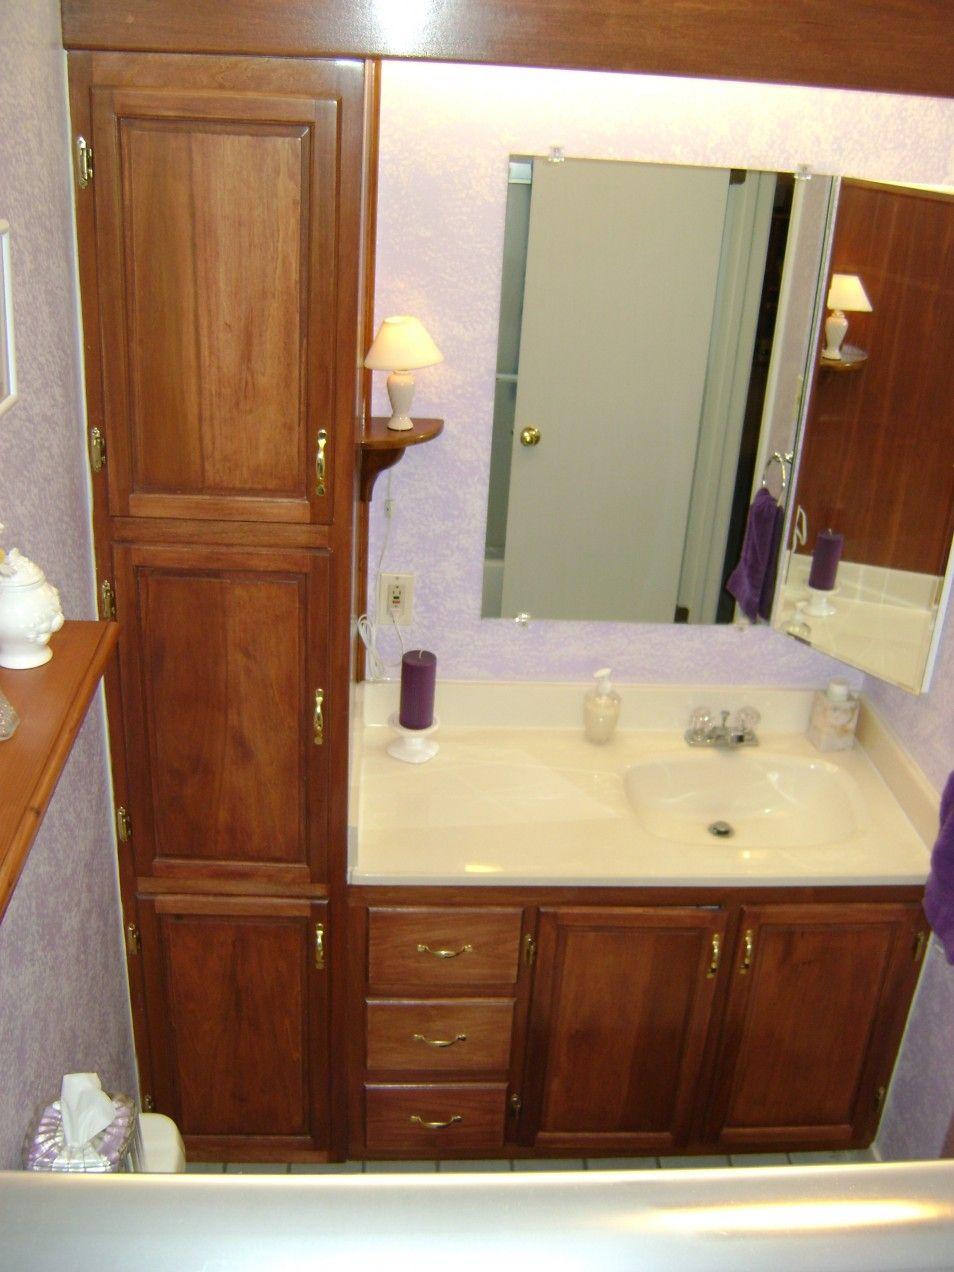 Bathroom Cabinets Linen Storage bathroom cabinet storage ideas for a neater home bathroom linen